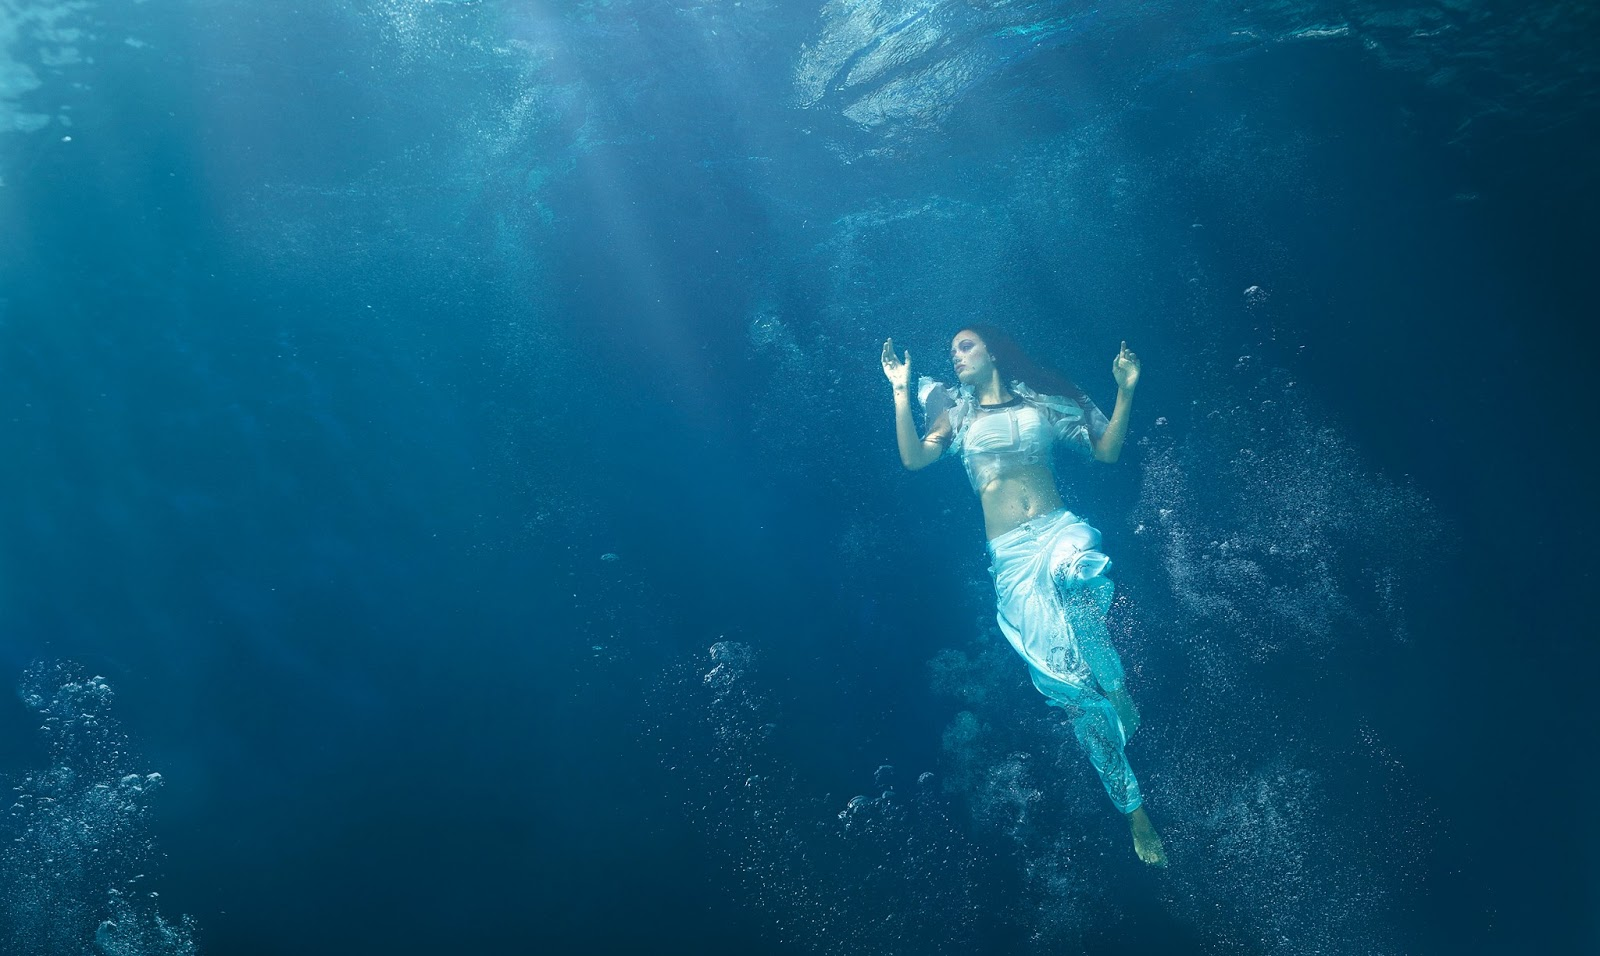 how to avoid drowning in ocean